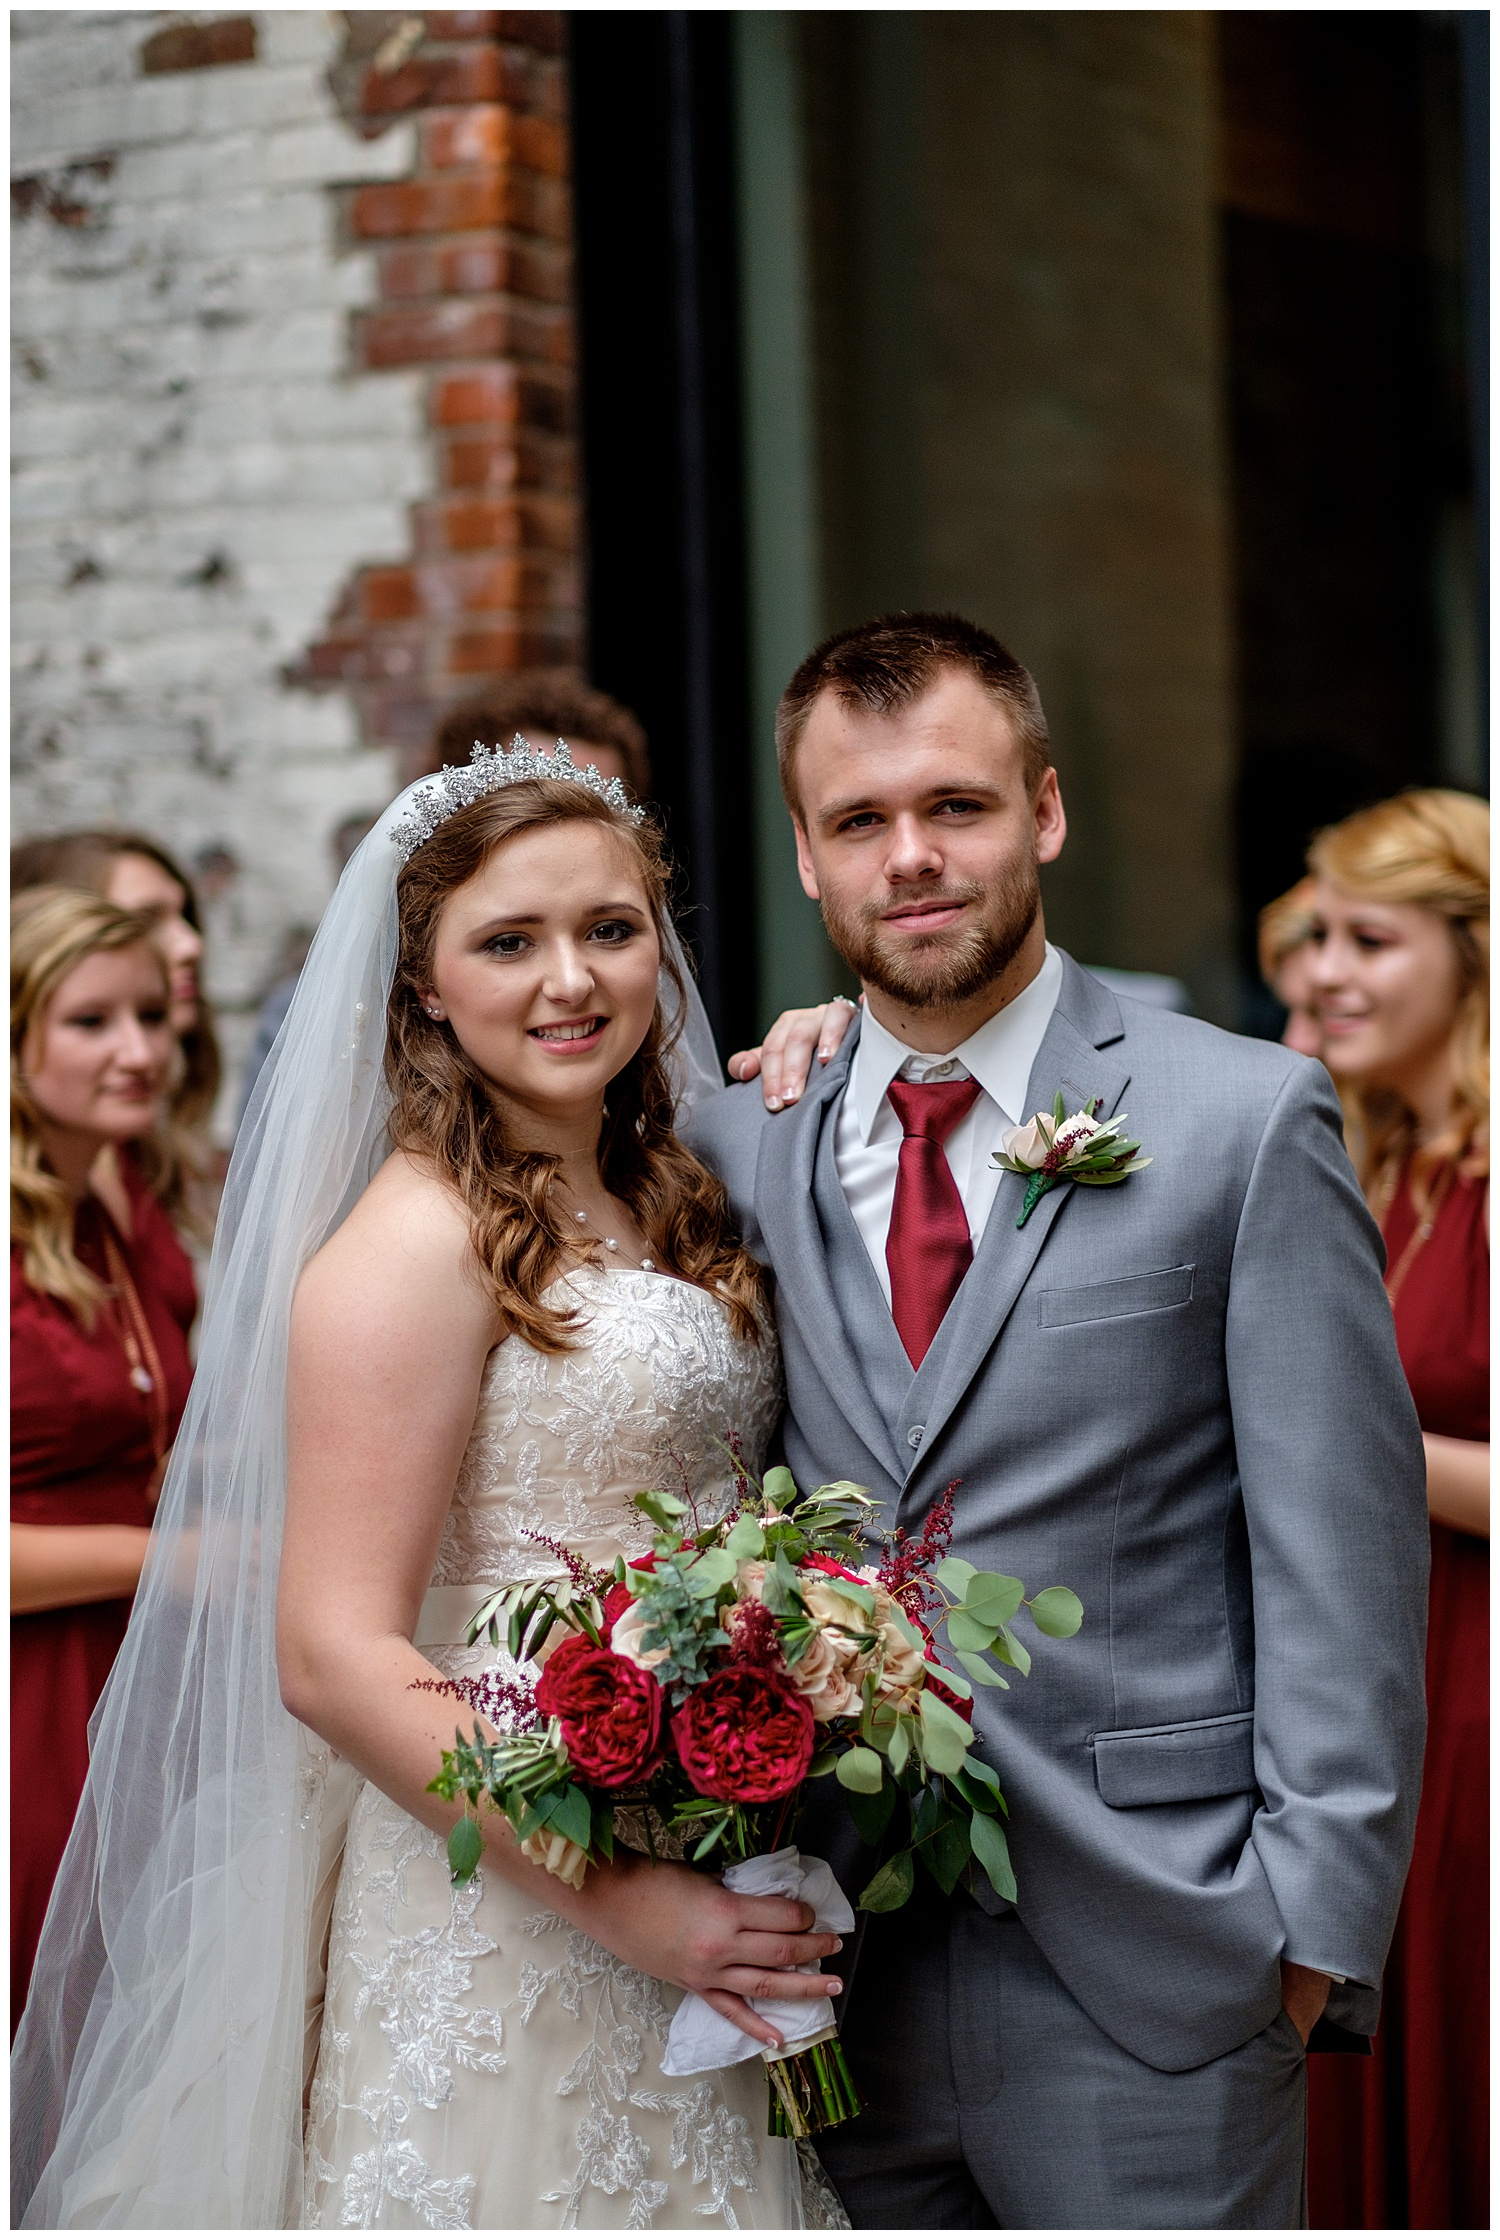 TheSmythCollective-Best-Cincinnati-Wedding-Photographer-Urban-Downtown-Covington-Wedding-14.jpg